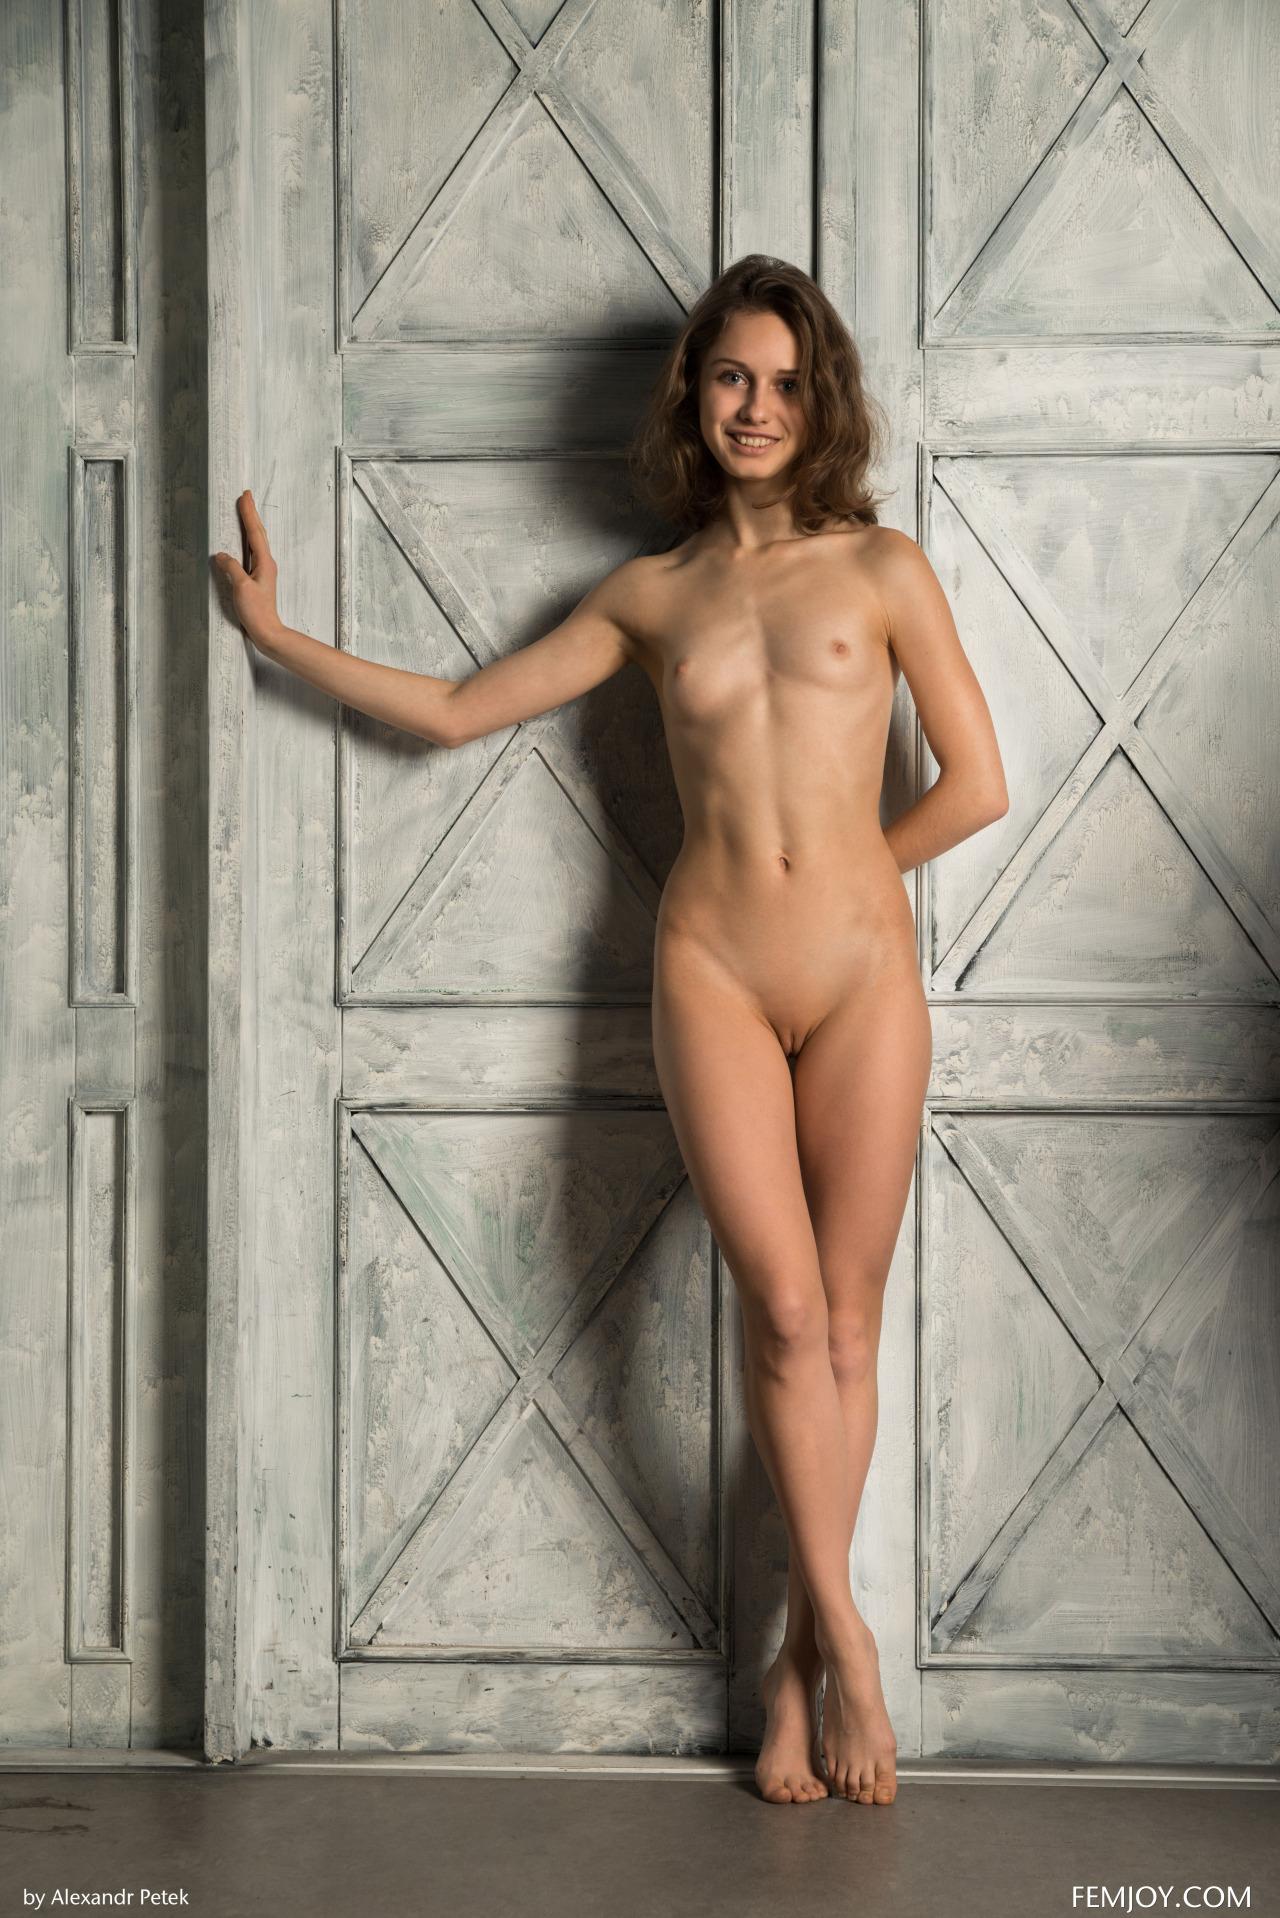 Elvira U Femjoy - First - Vanilla Babes